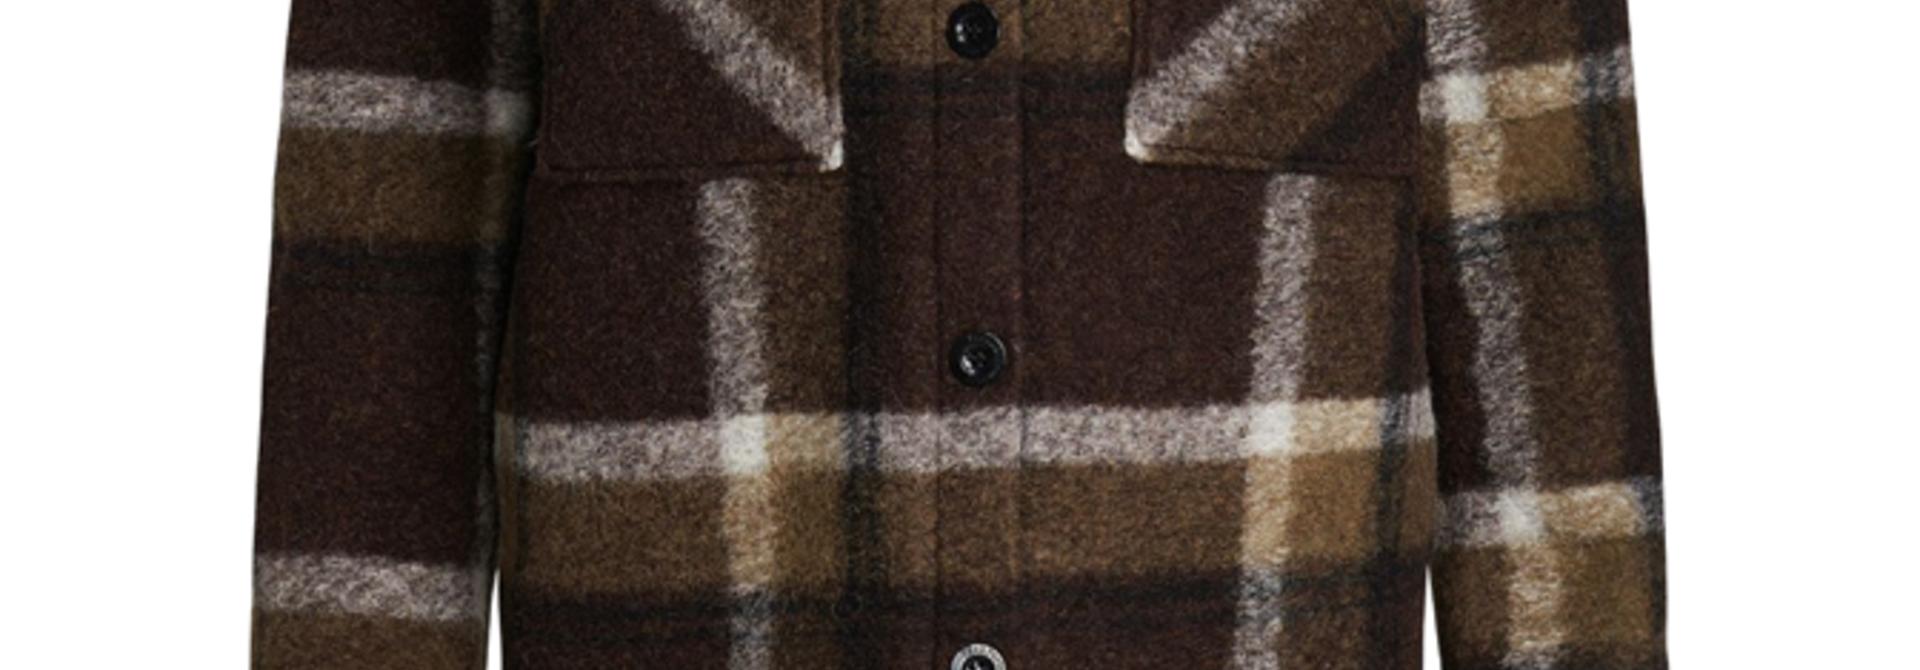 Peak Performance Kelly Wool Shirt Jacket-909 CHECK G75288030